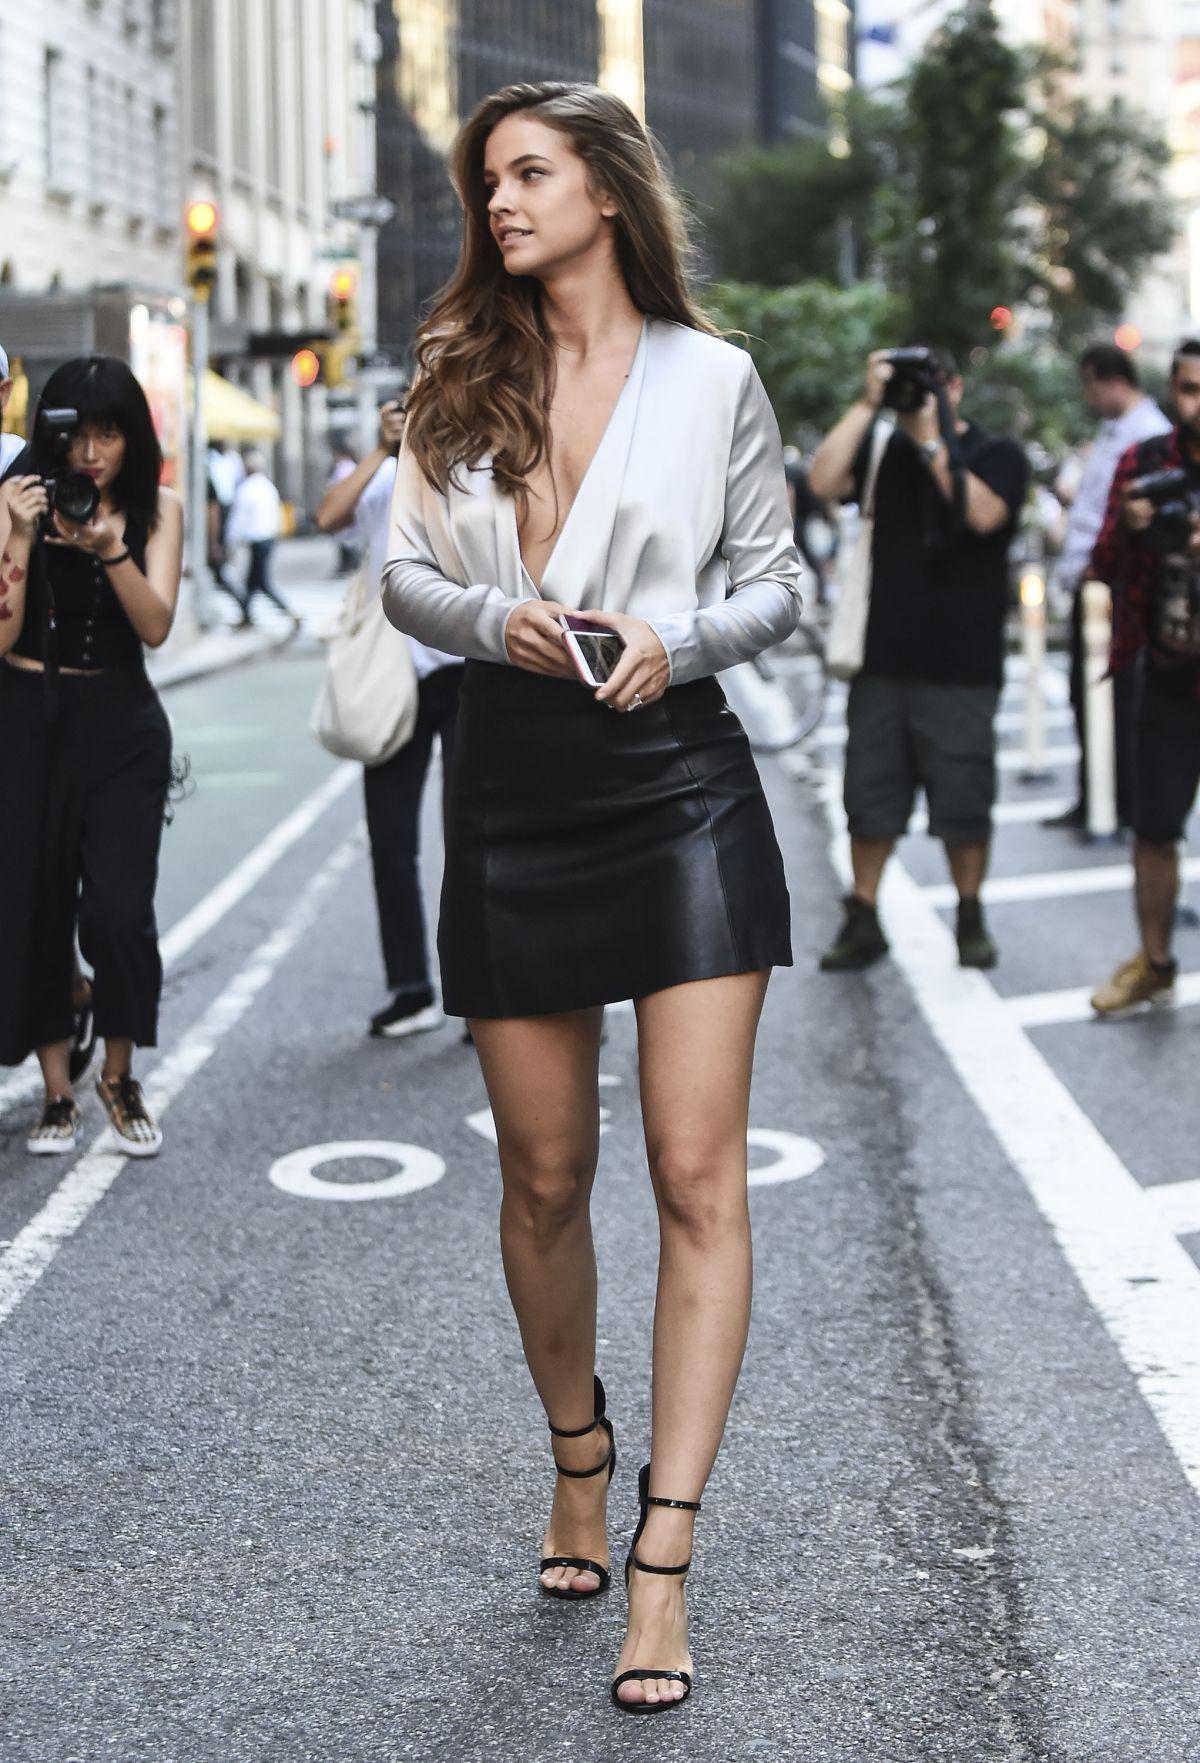 Adriana lima mini skirt, gorgian porn